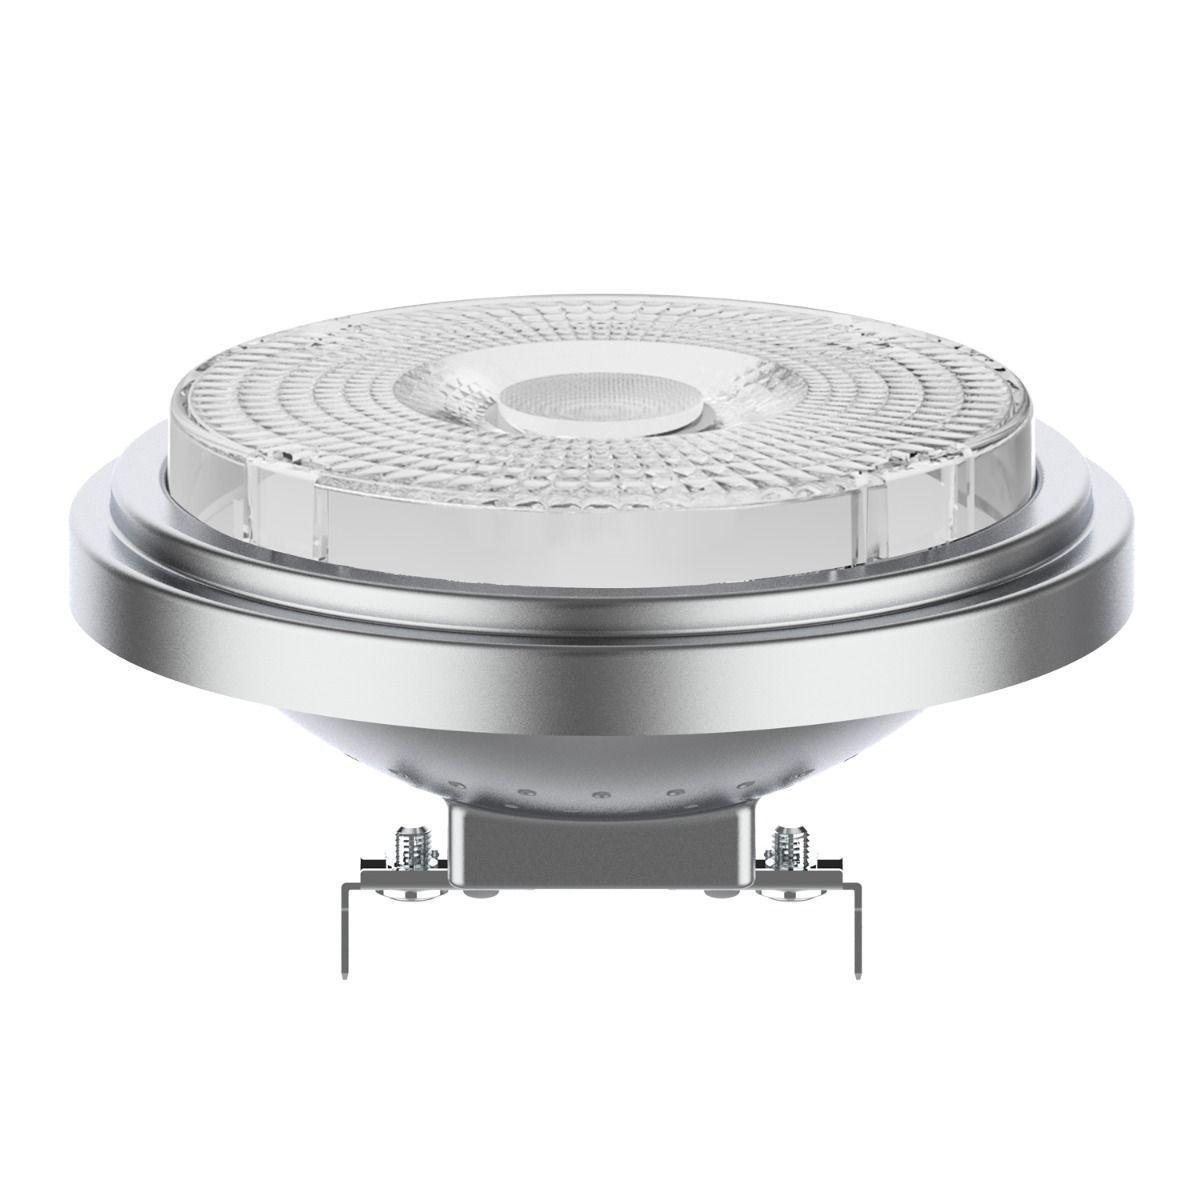 Noxion Lucent LED Spot AR111 G53 12V 7.3W 927 40D   Dimbaar - Hoogste Kleurweergave - Vervanger voor 50W